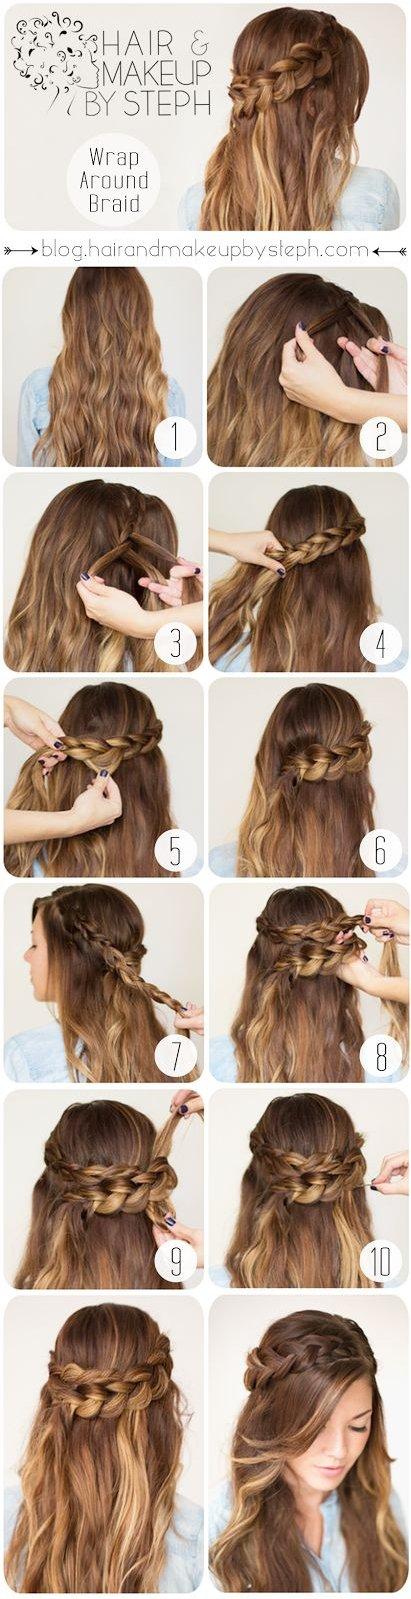 hair,brown,clothing,hairstyle,long hair,